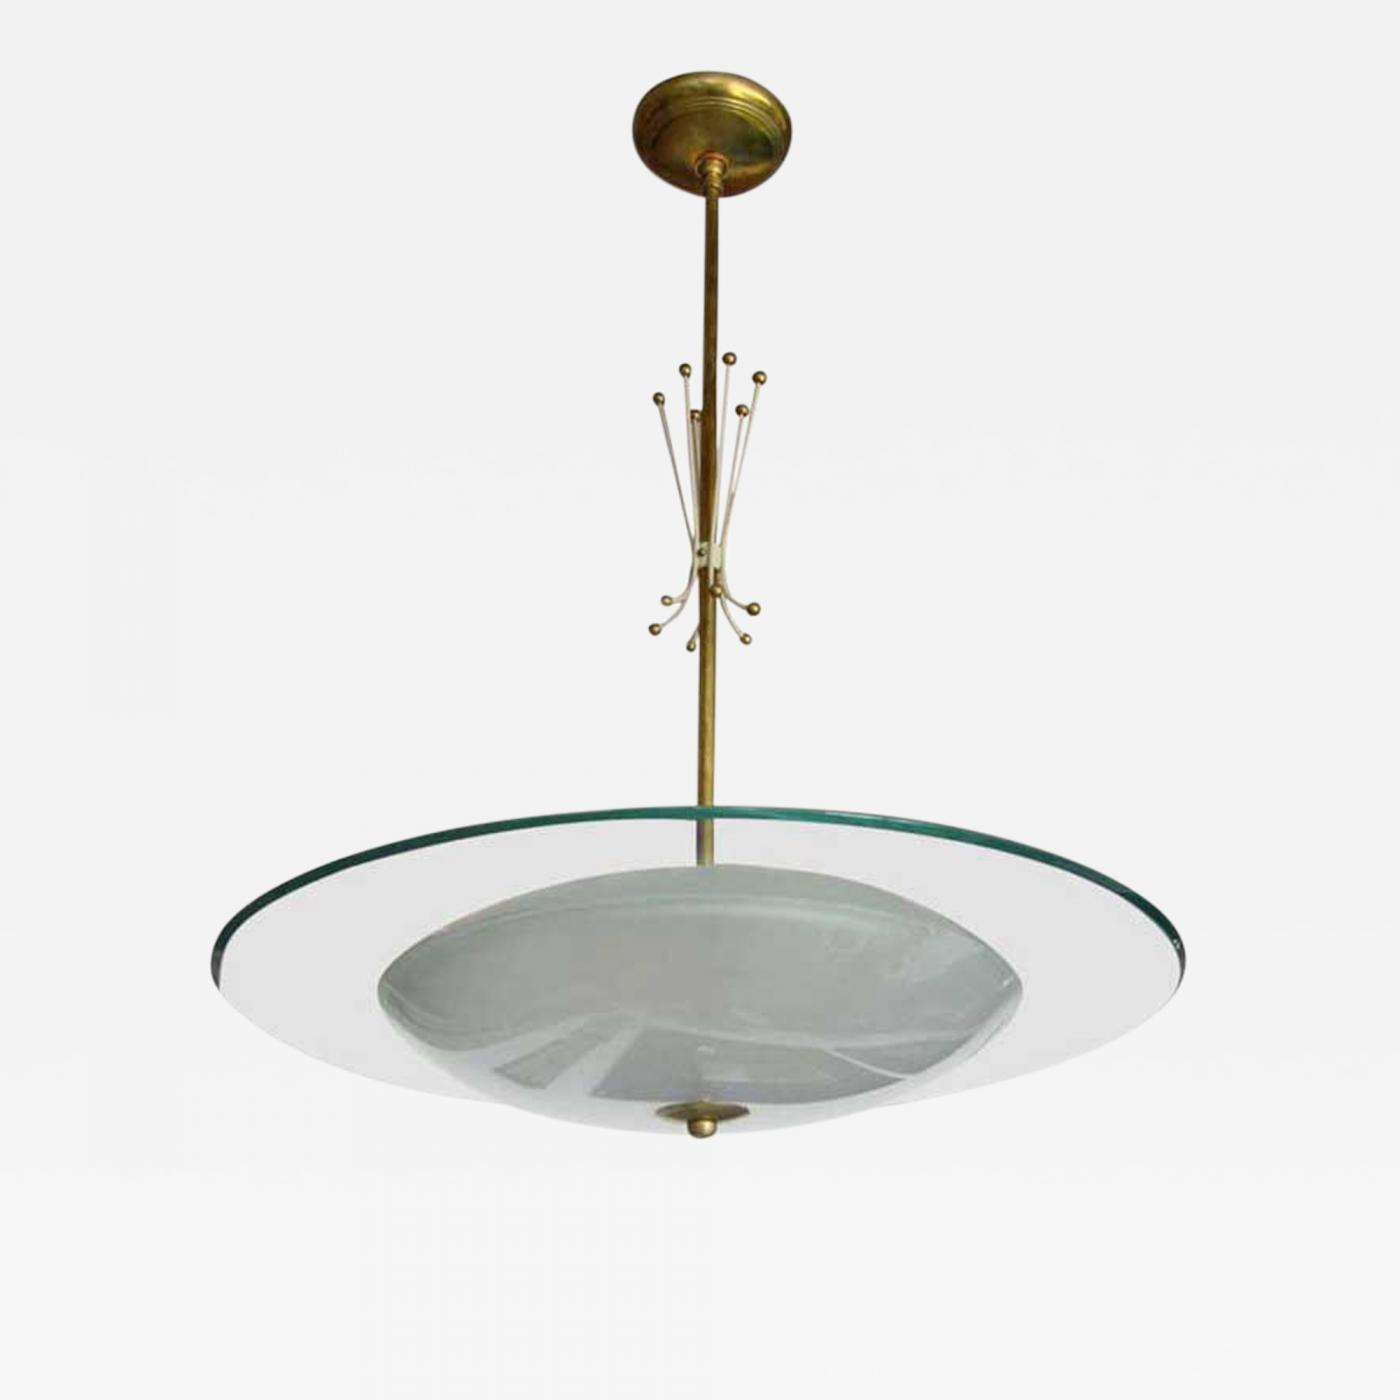 Mid Century Modern Atomic Chandelier in the Style of Fontana Arte